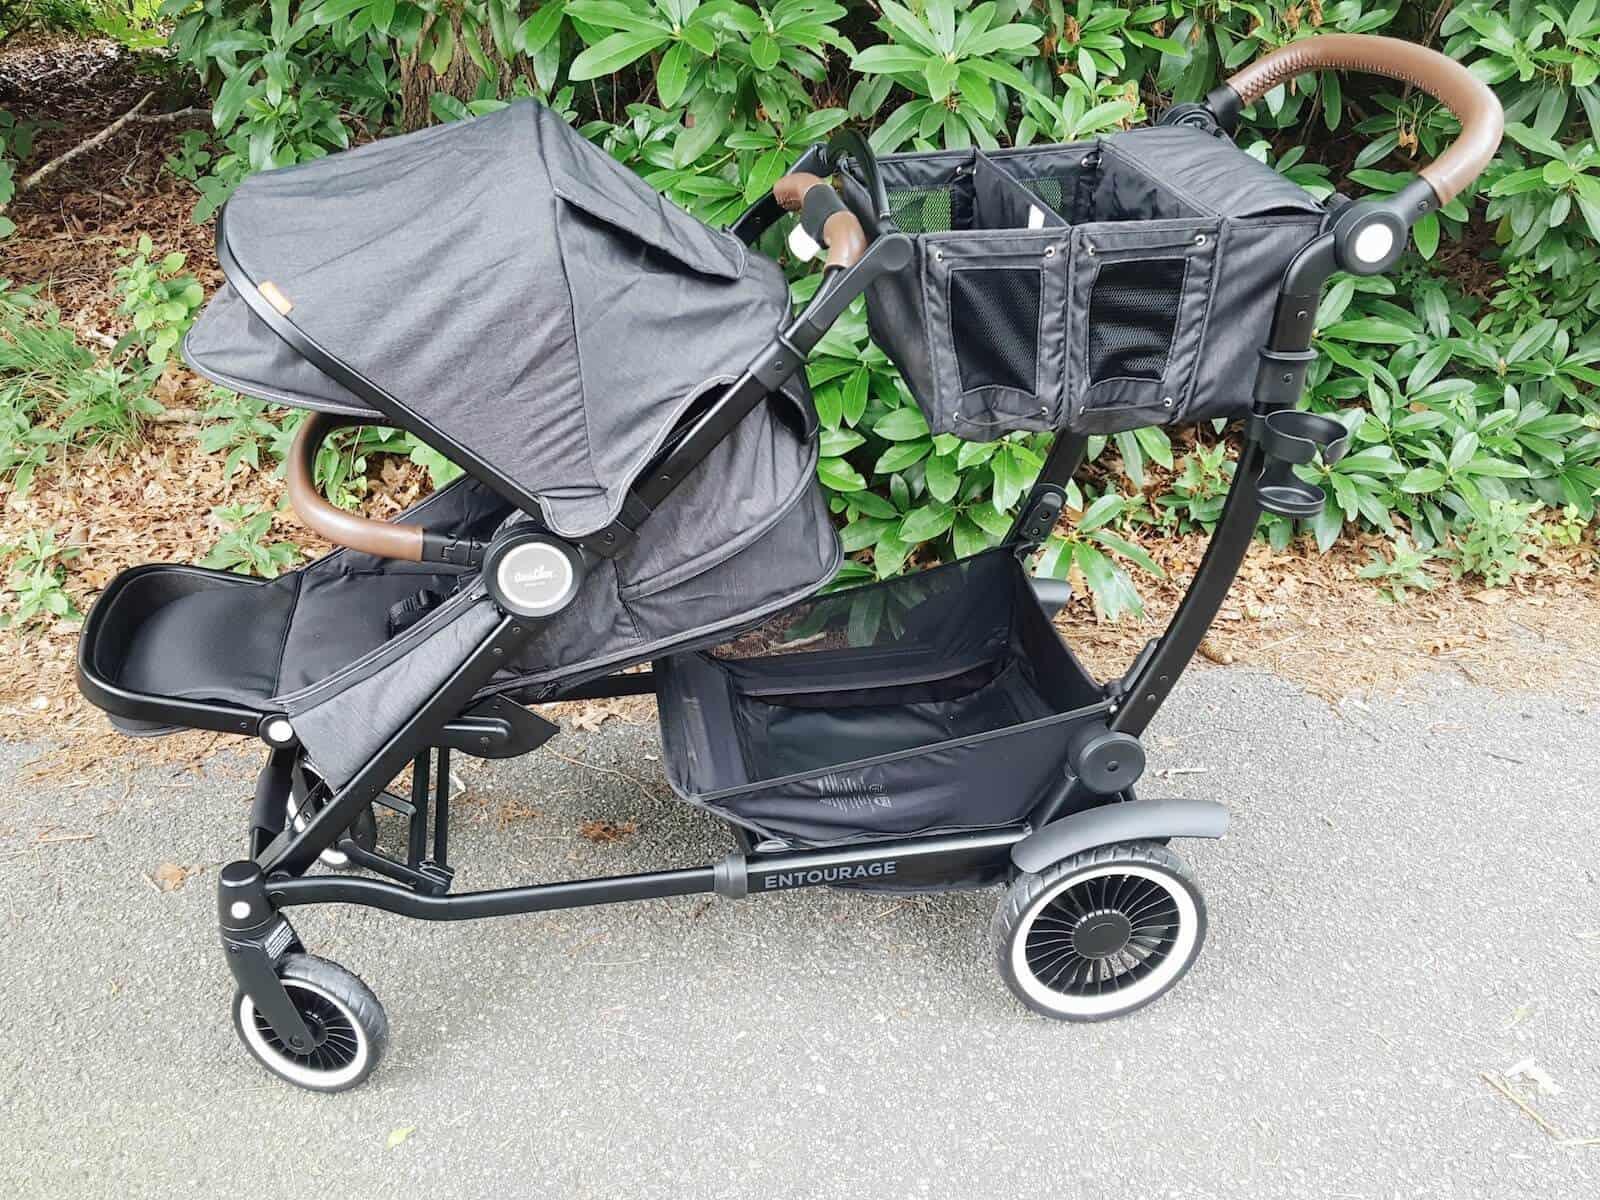 Austlen Entourage Workhorse Stroller for families on walking path.